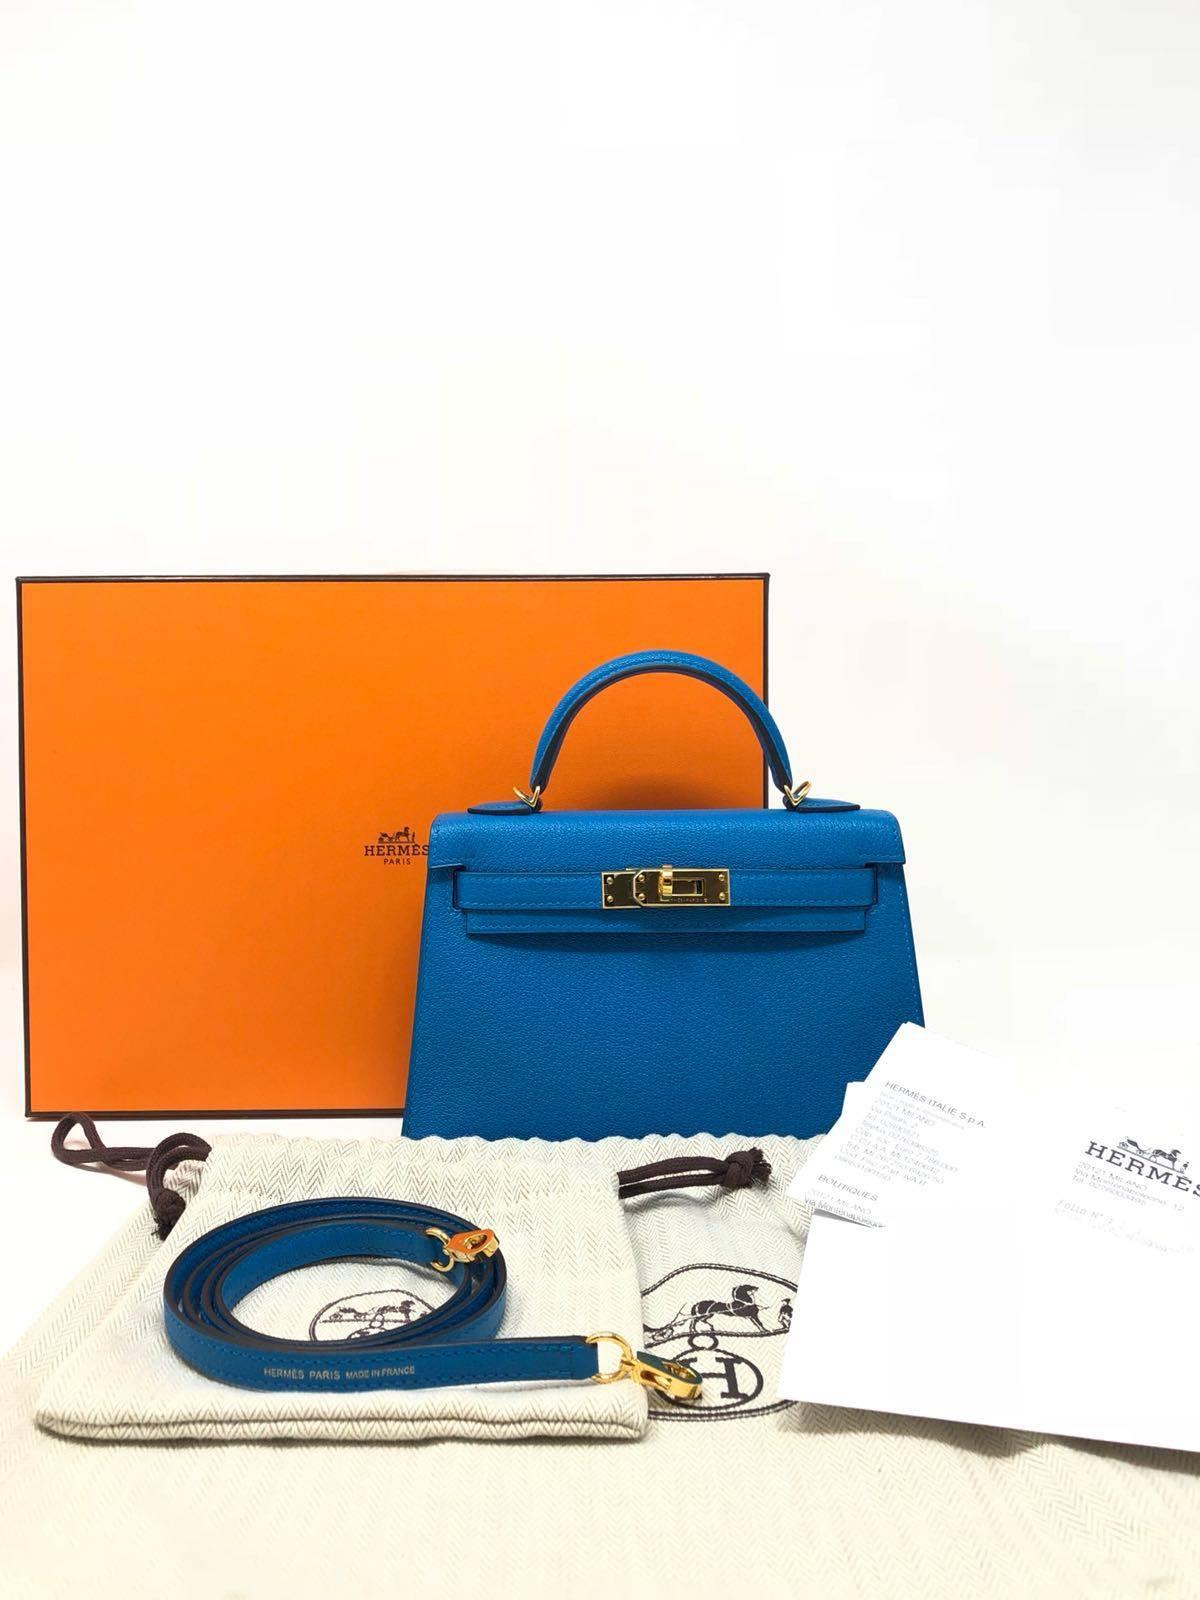 12b472f51b43 ... wholesale hermes kelly bag 20 mini kelly ii blue zanzibar chevre gold  hardware 2017 for sale